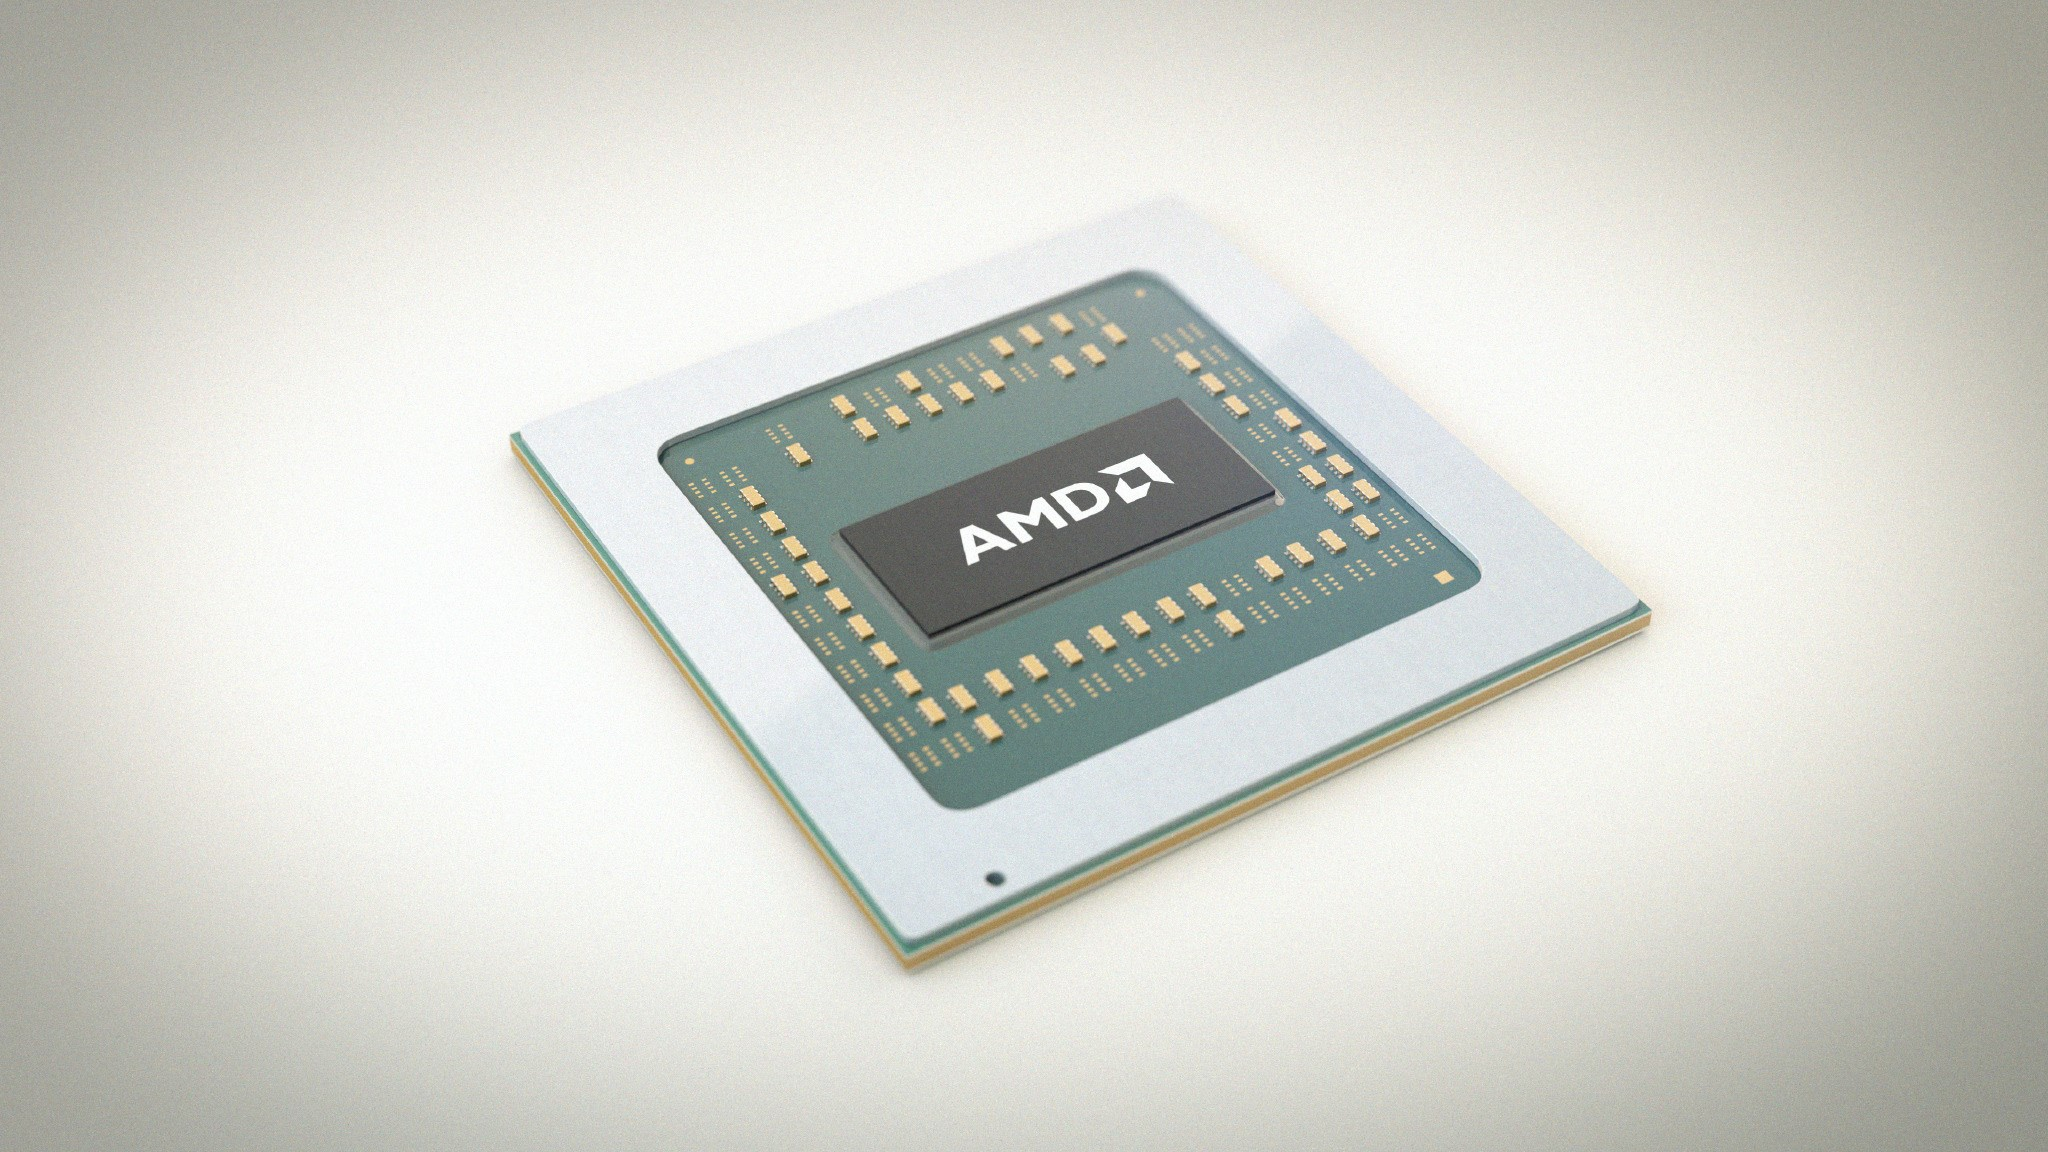 AMD lansează procesoarele EPYC Embedded și Ryzen Embedded